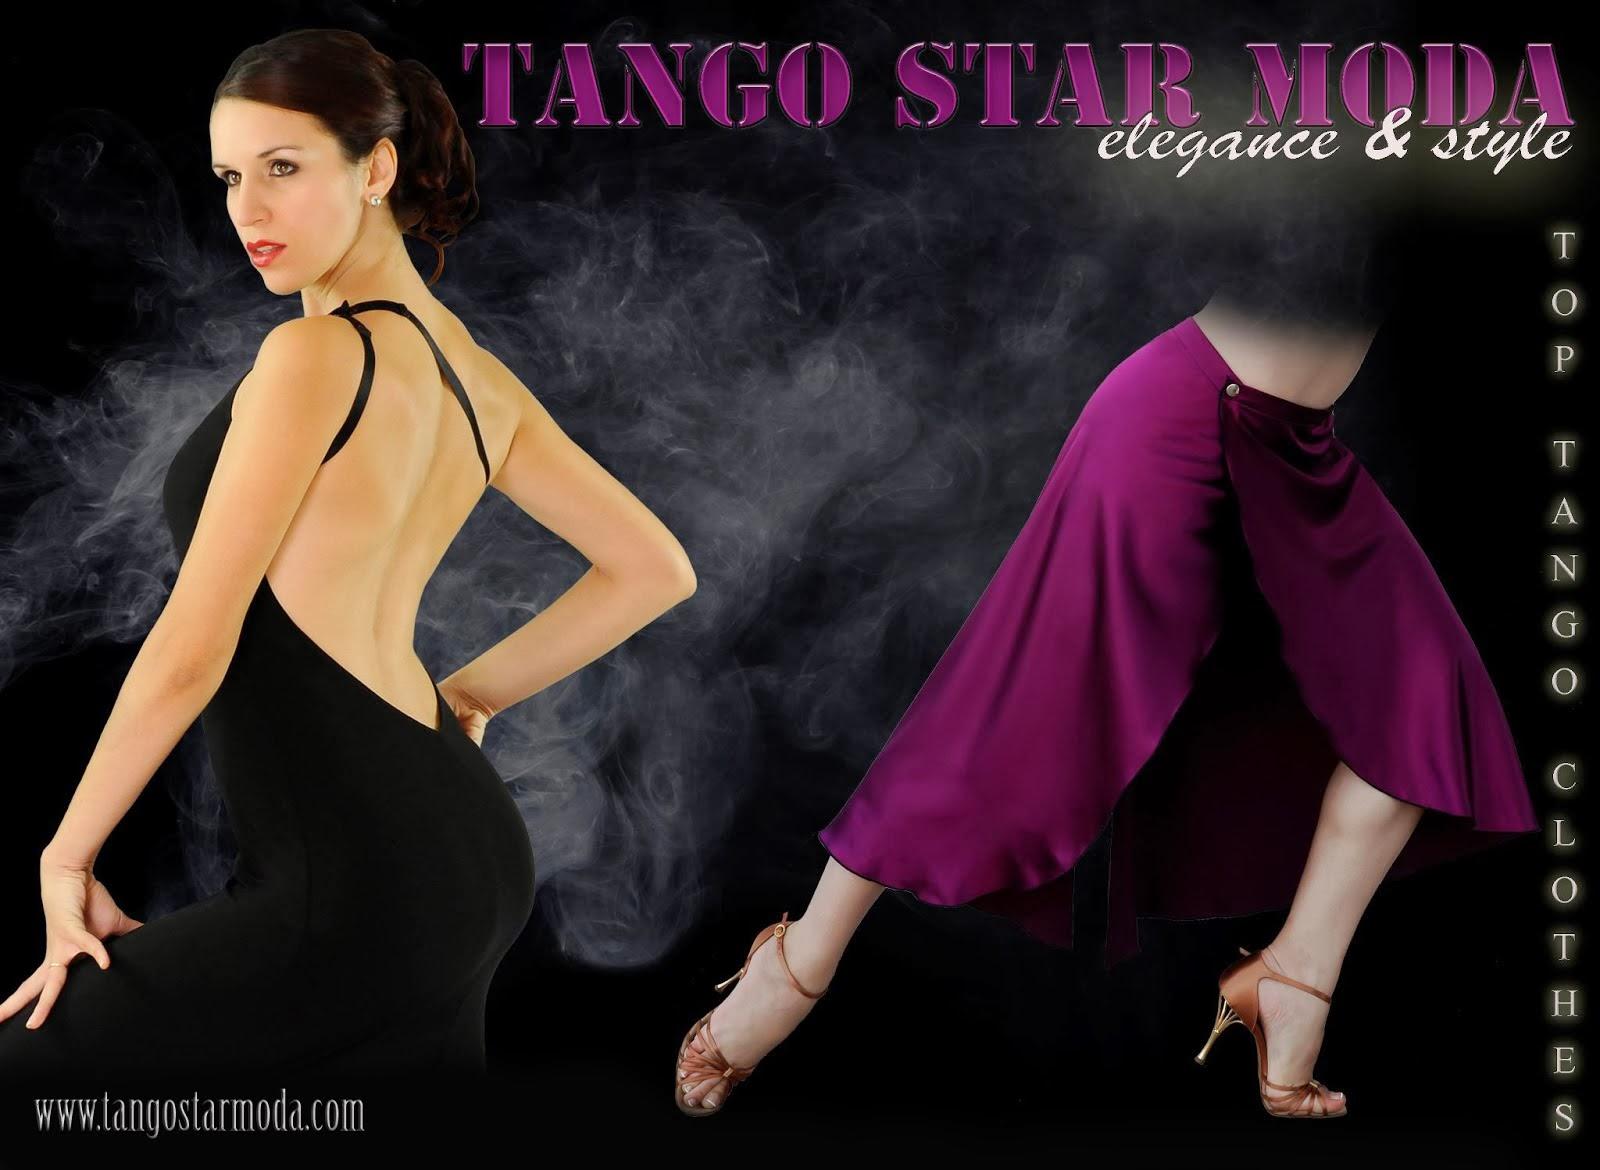 www.tangostarmoda.com